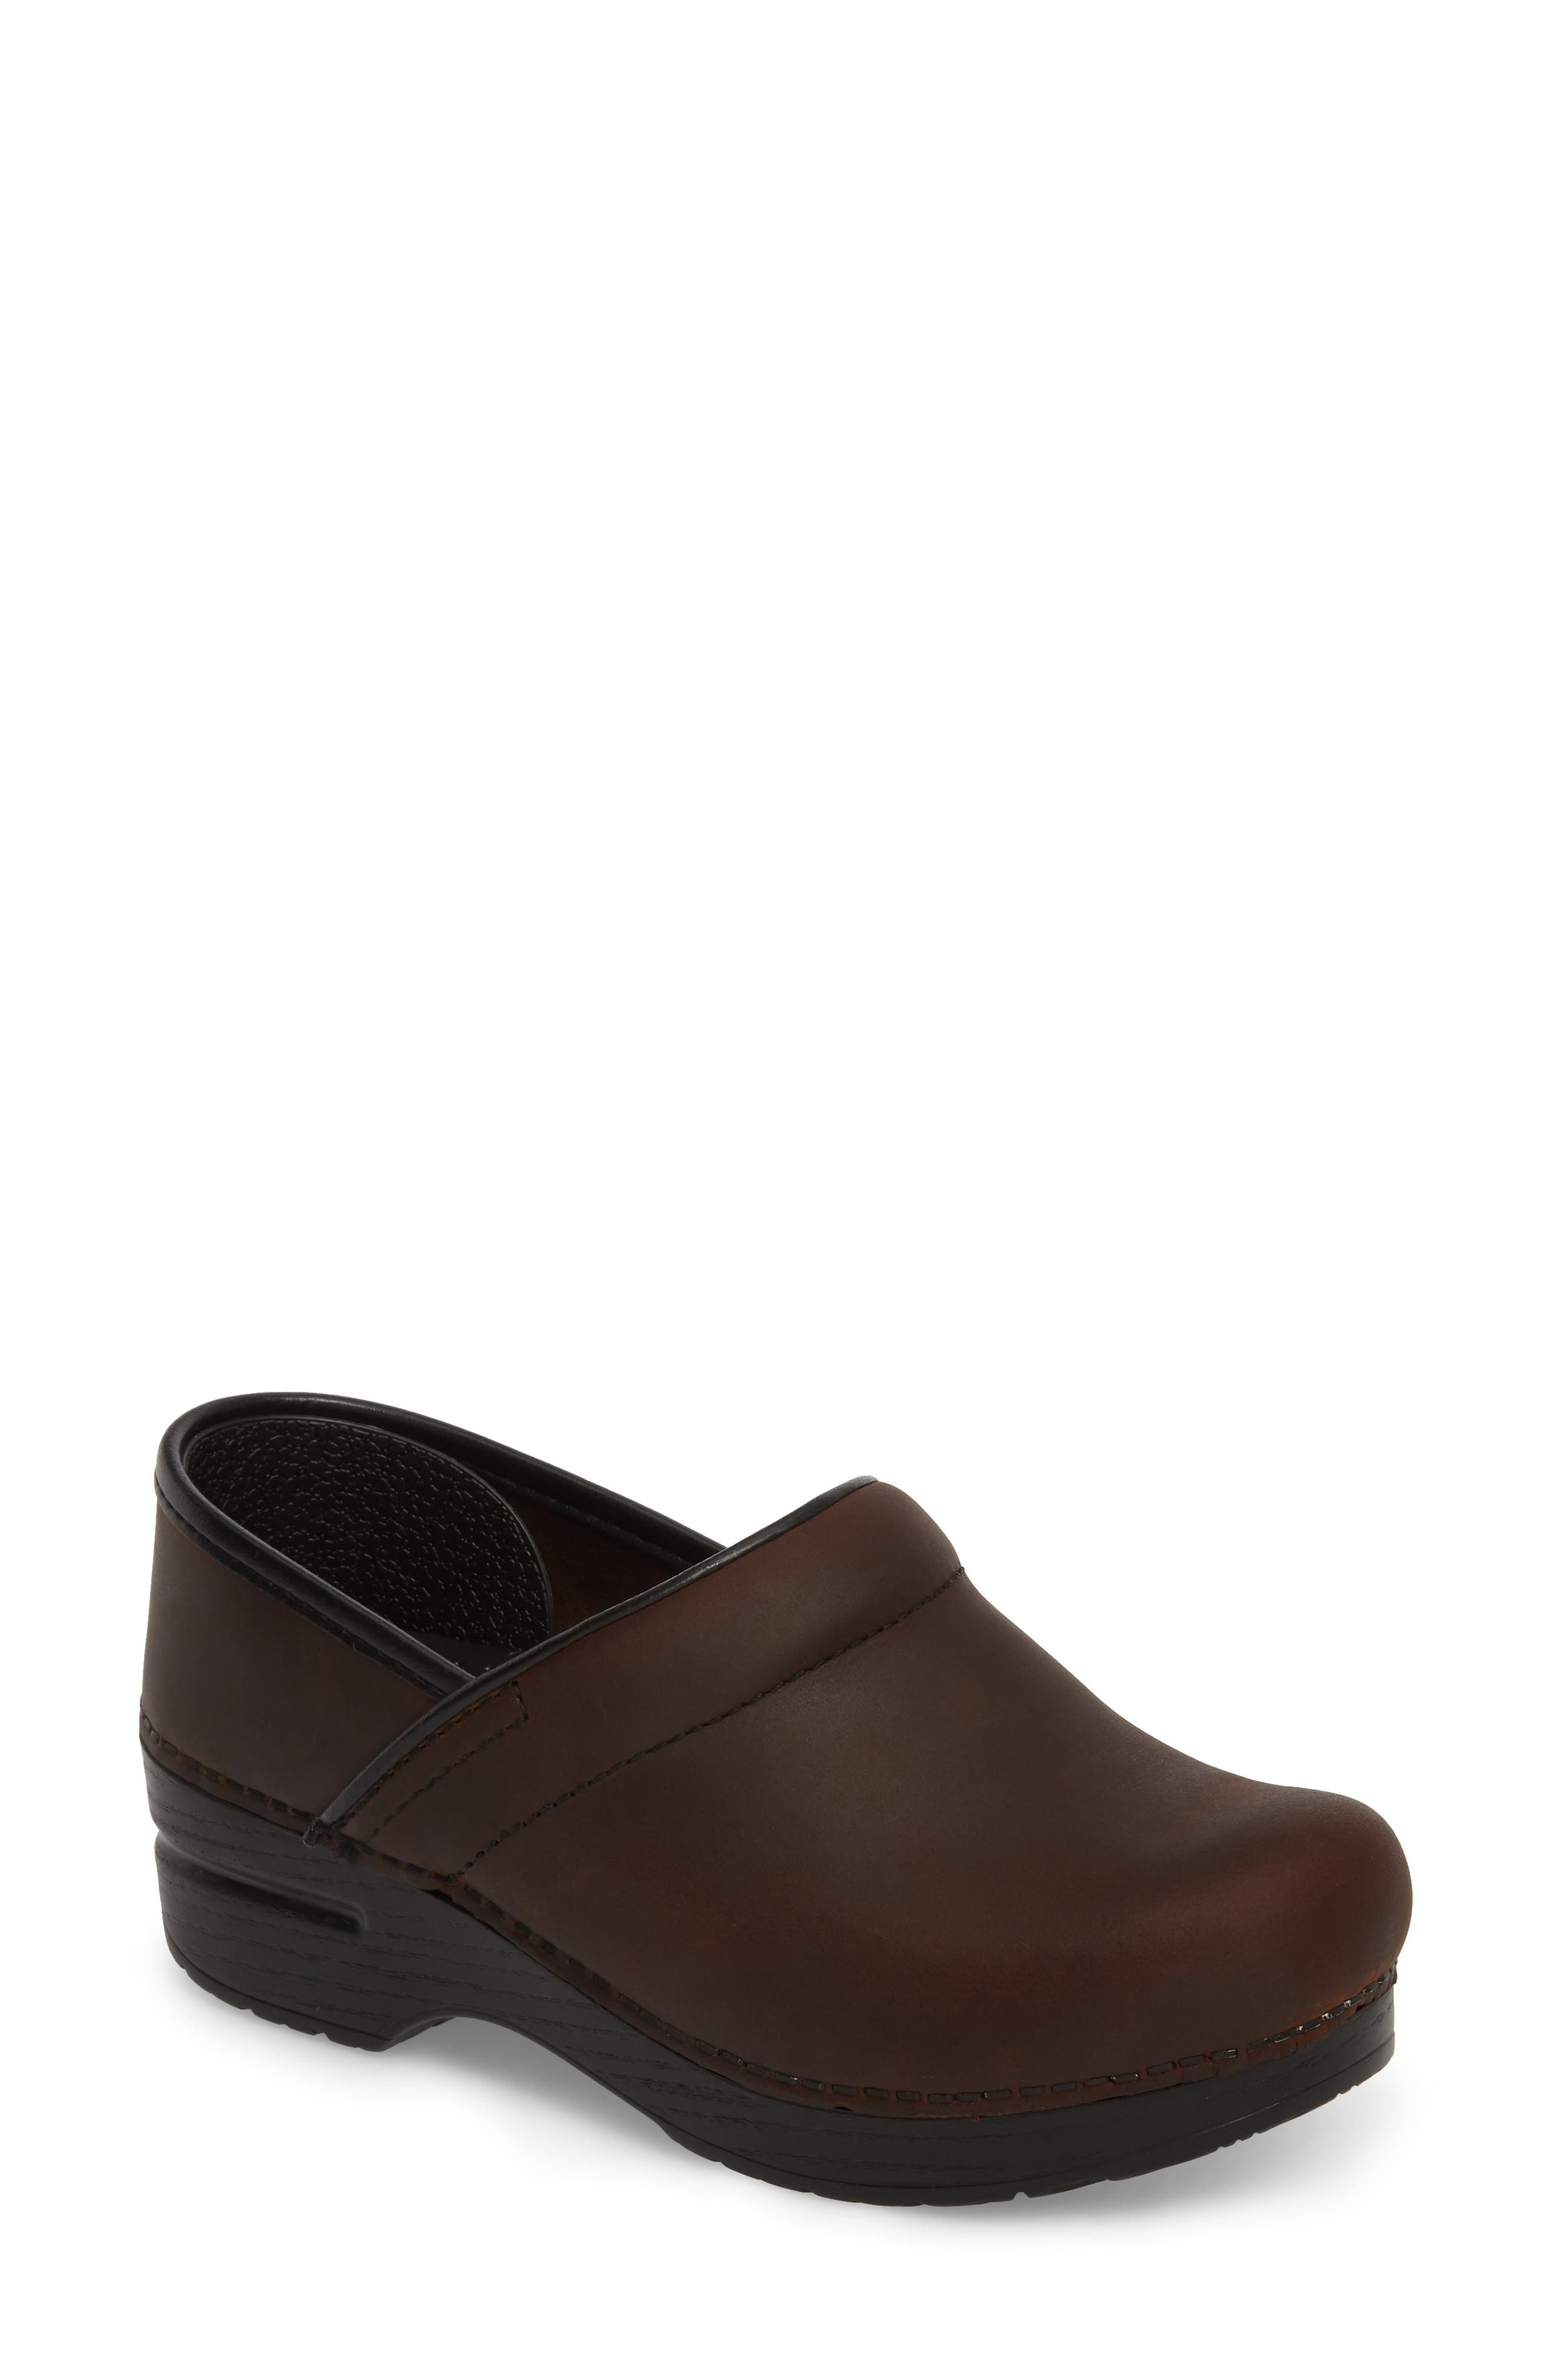 Wide Pro Clog,                             Main thumbnail 1, color,                             Antique Brown/ Black Leather